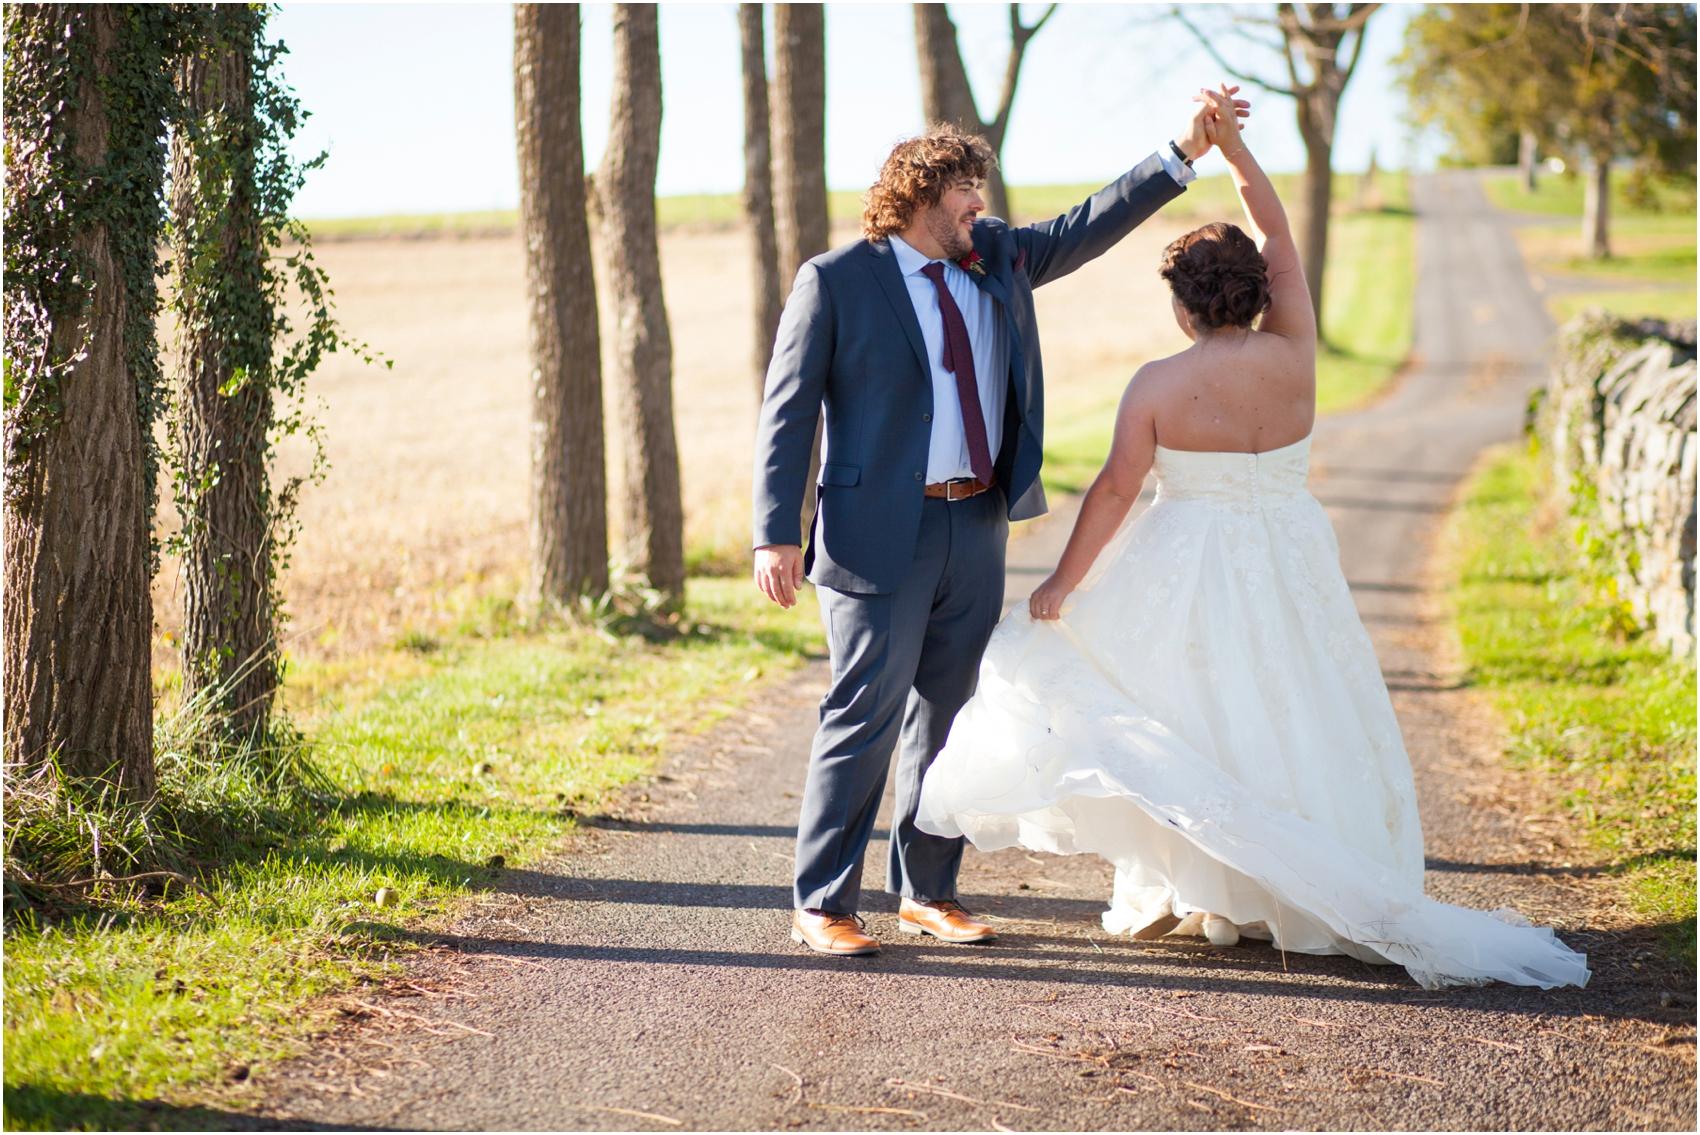 On-Sunny-Slope-Farm-Fall-Virginia-Wedding-3100.jpg